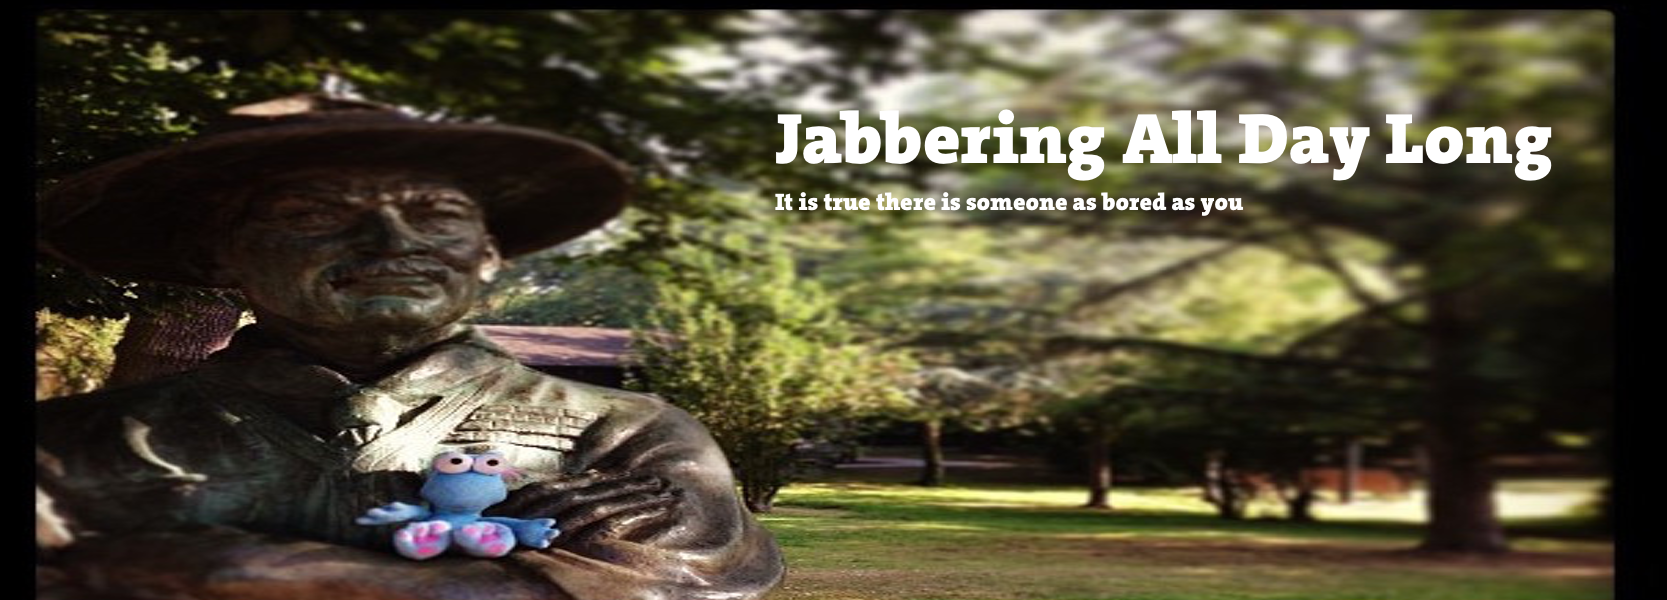 Jabbering All Day Long